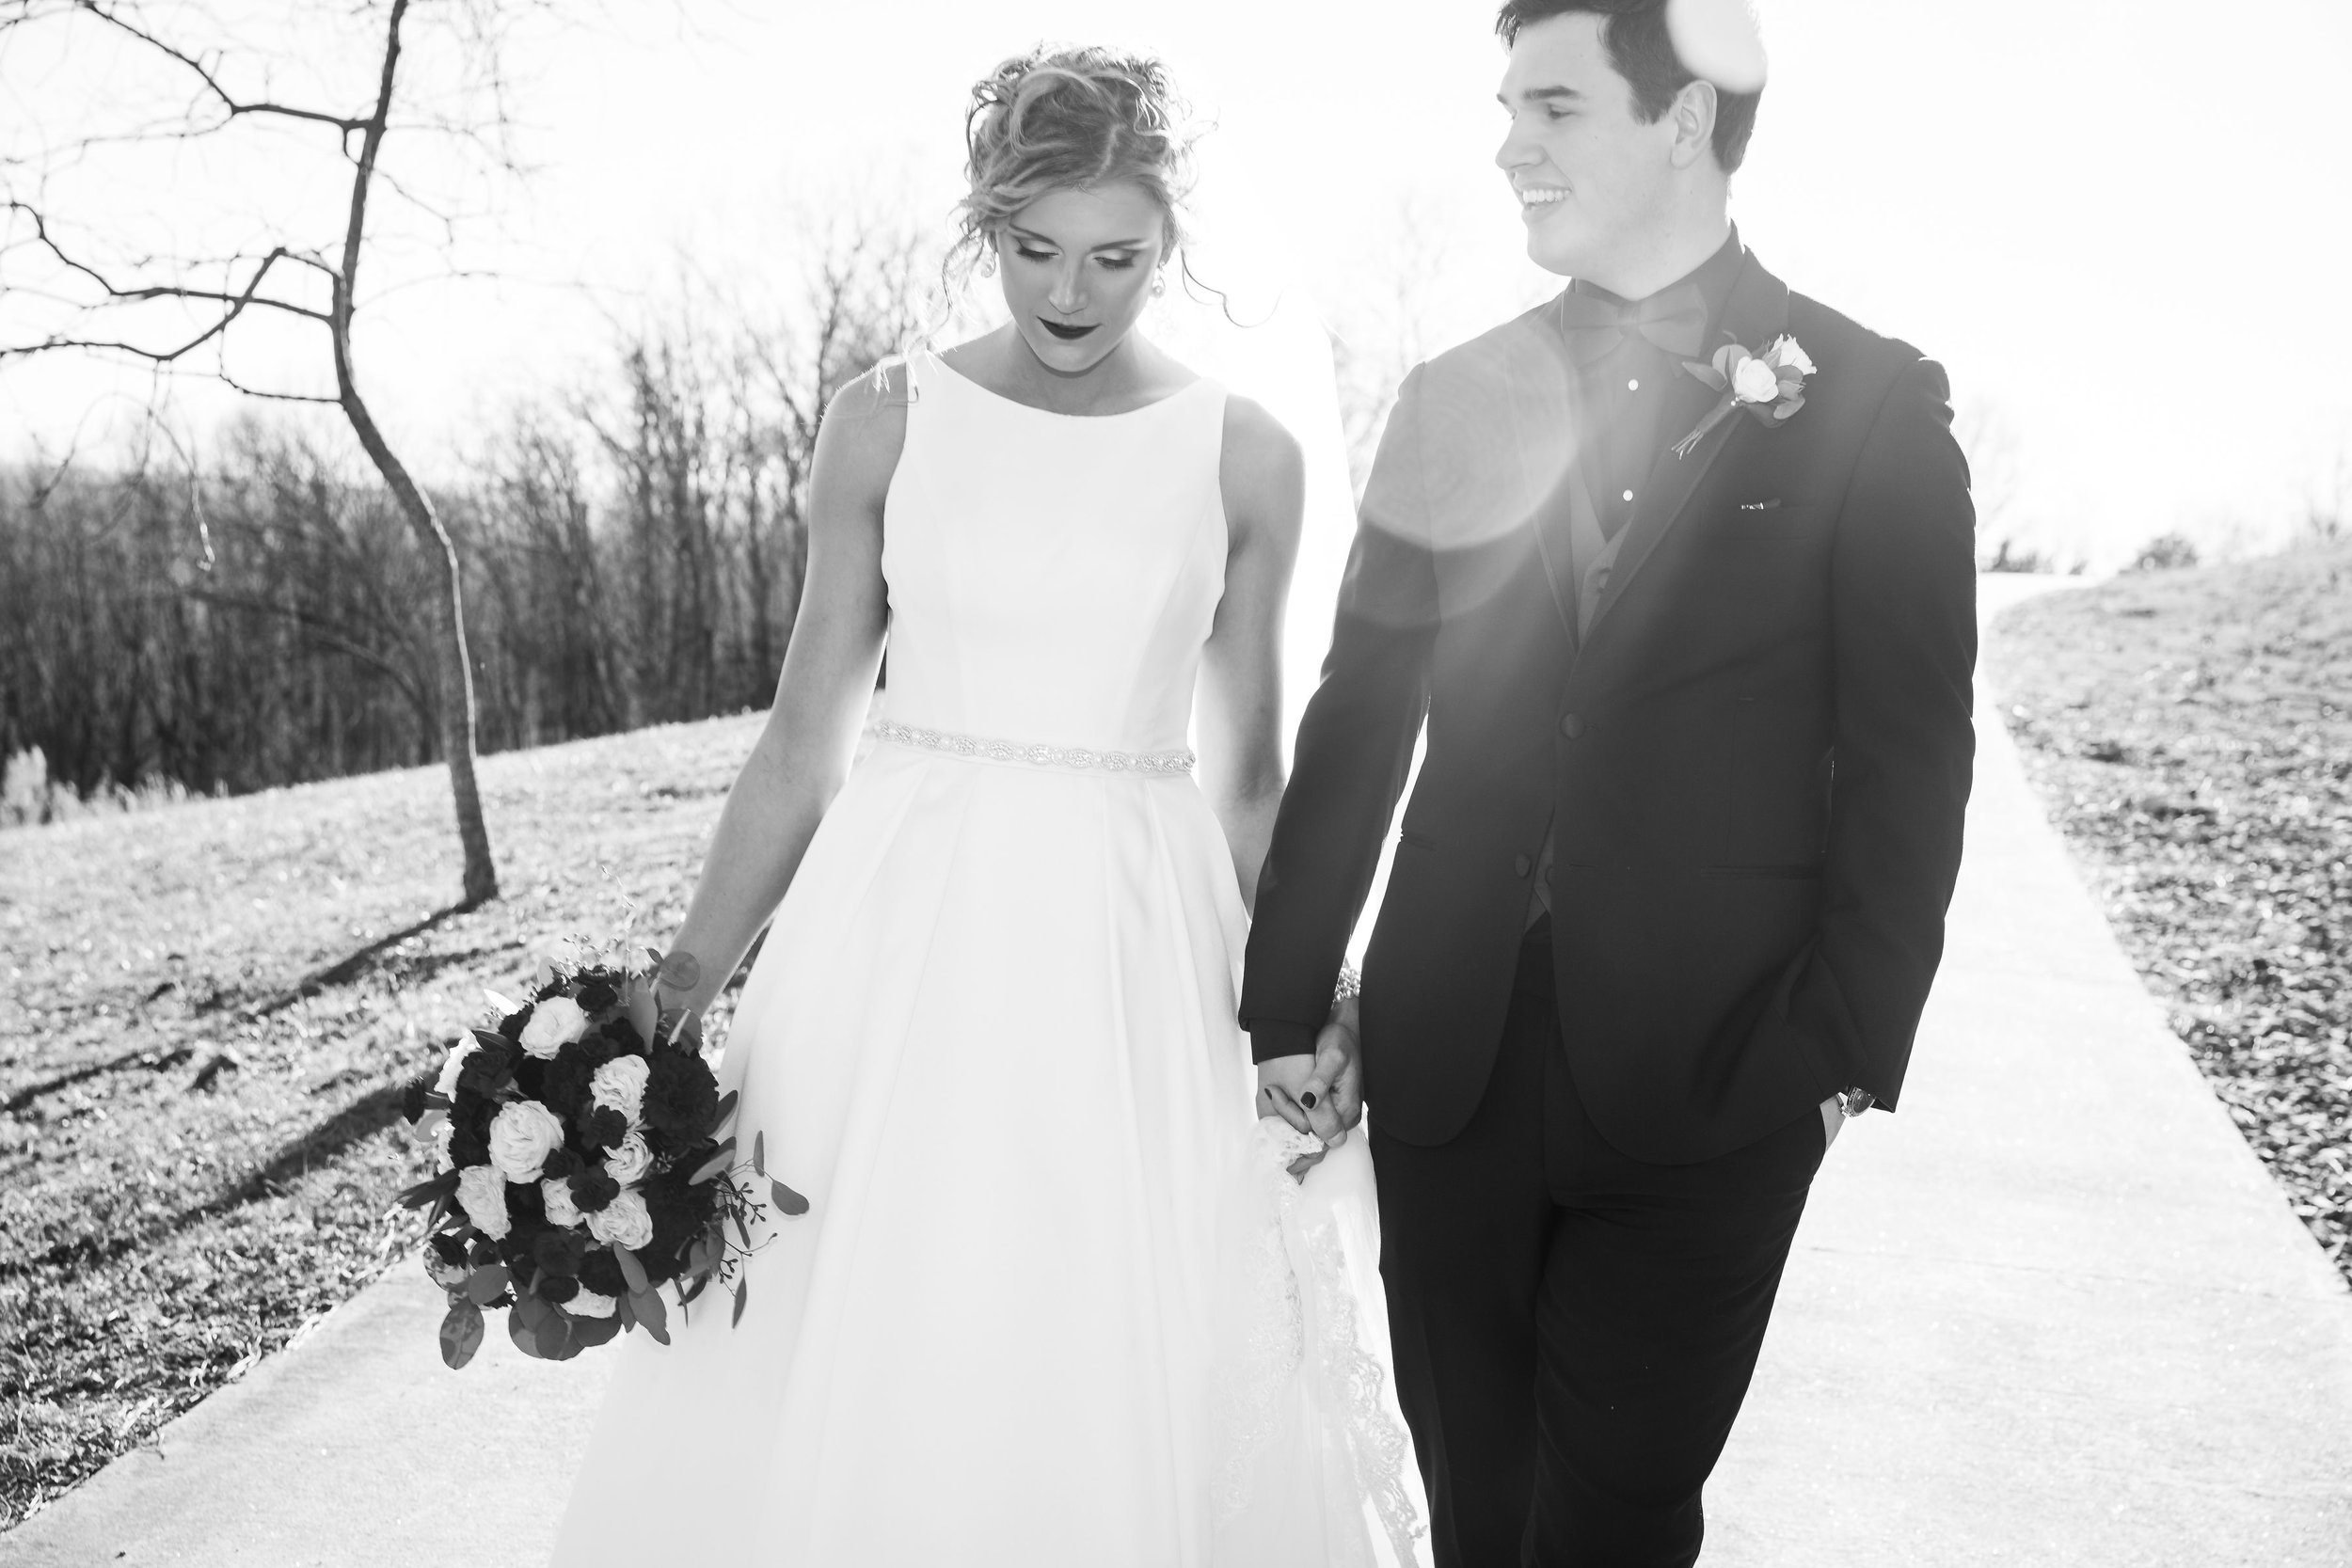 Britni & Garrett Chisenall - January 5, 2019Sara Grace Photography